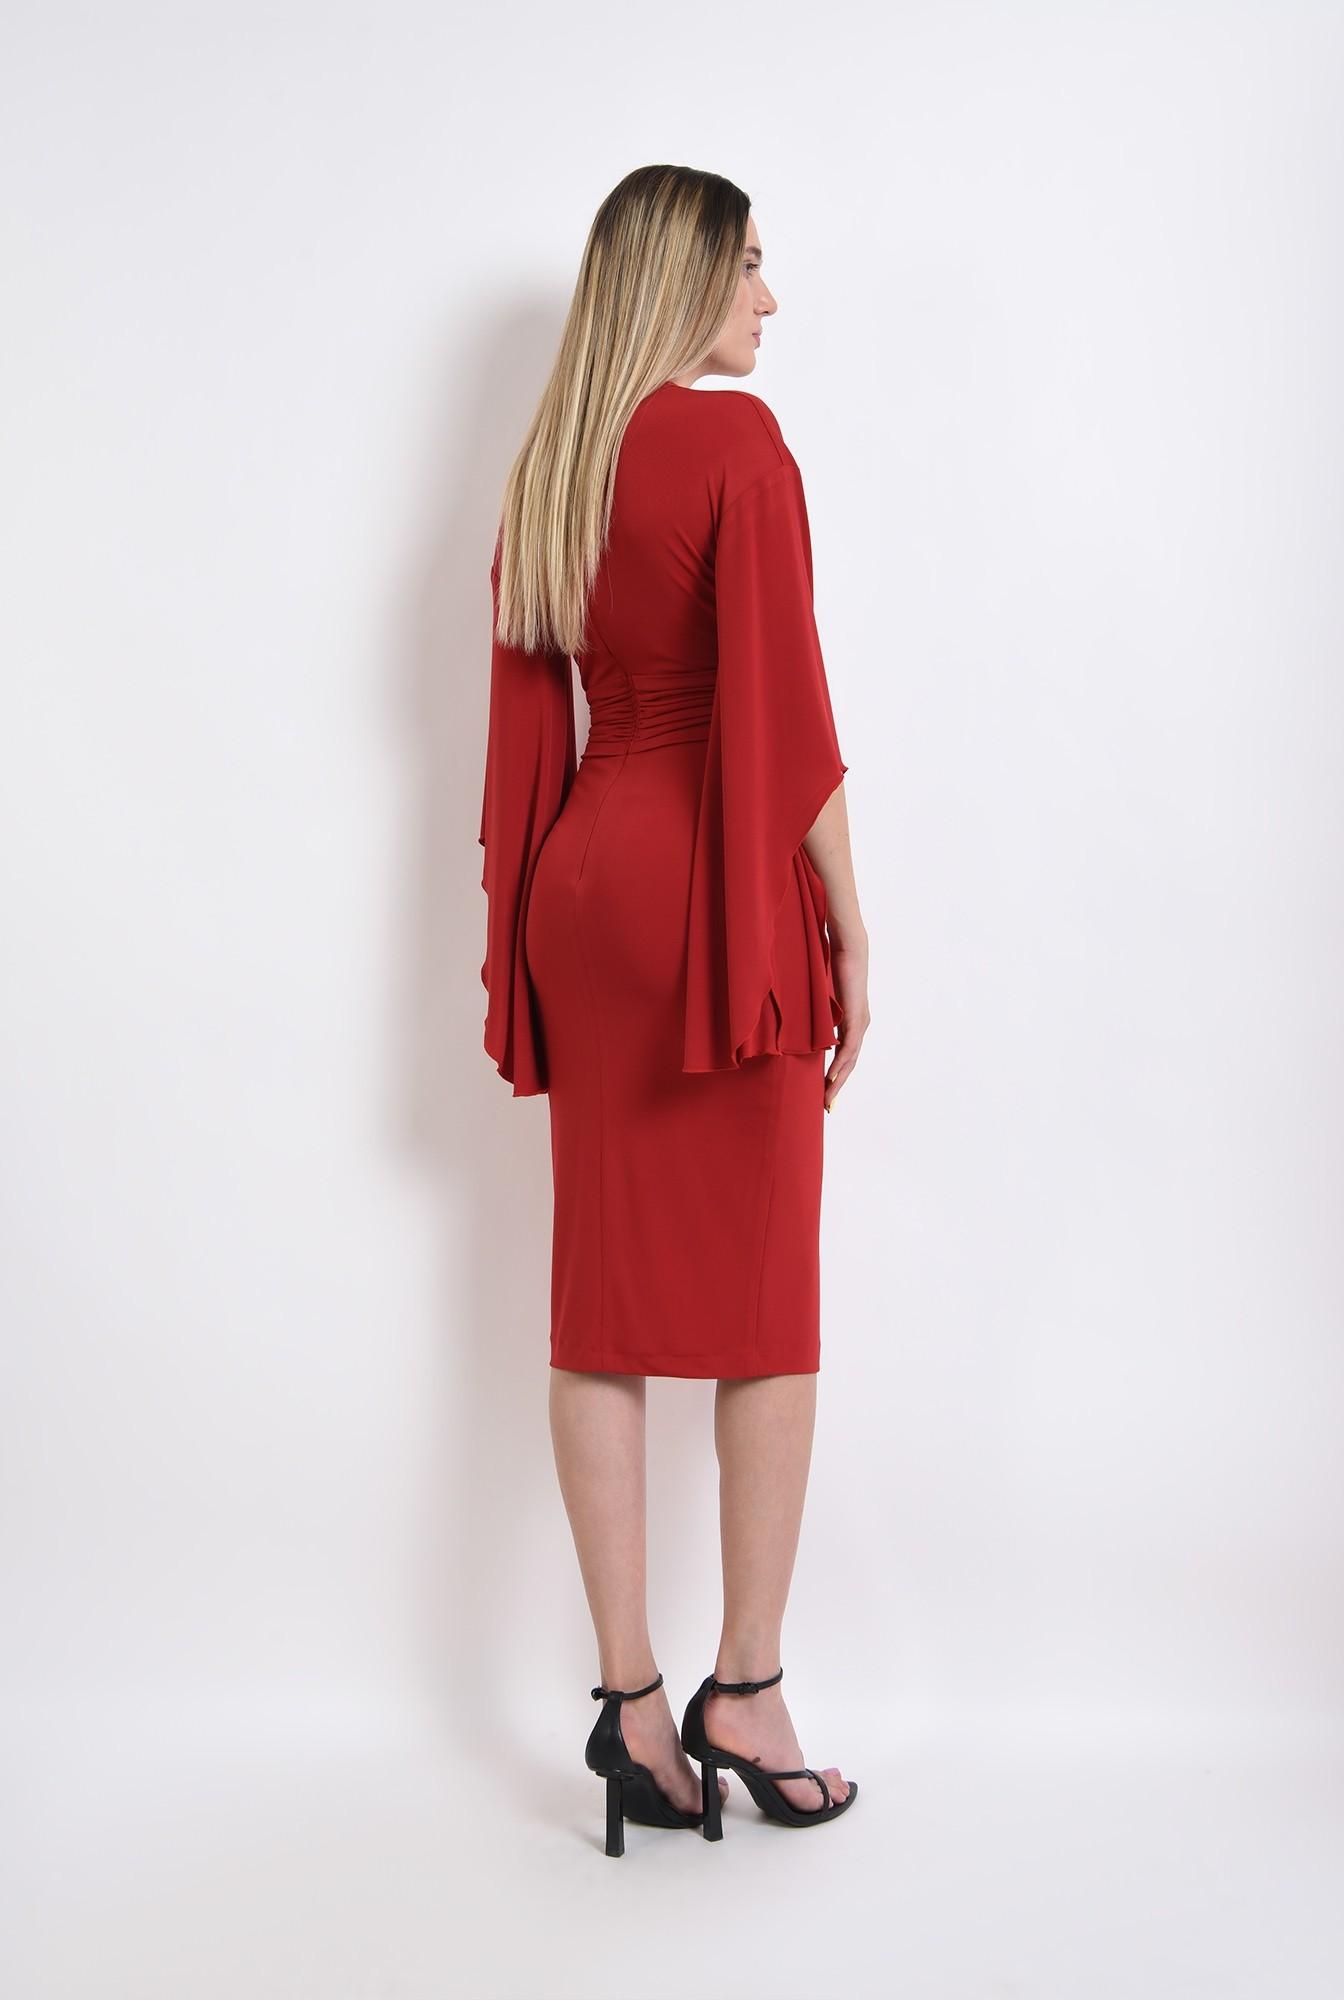 2 - rochie rosie, eleganta, cu maneci evazate